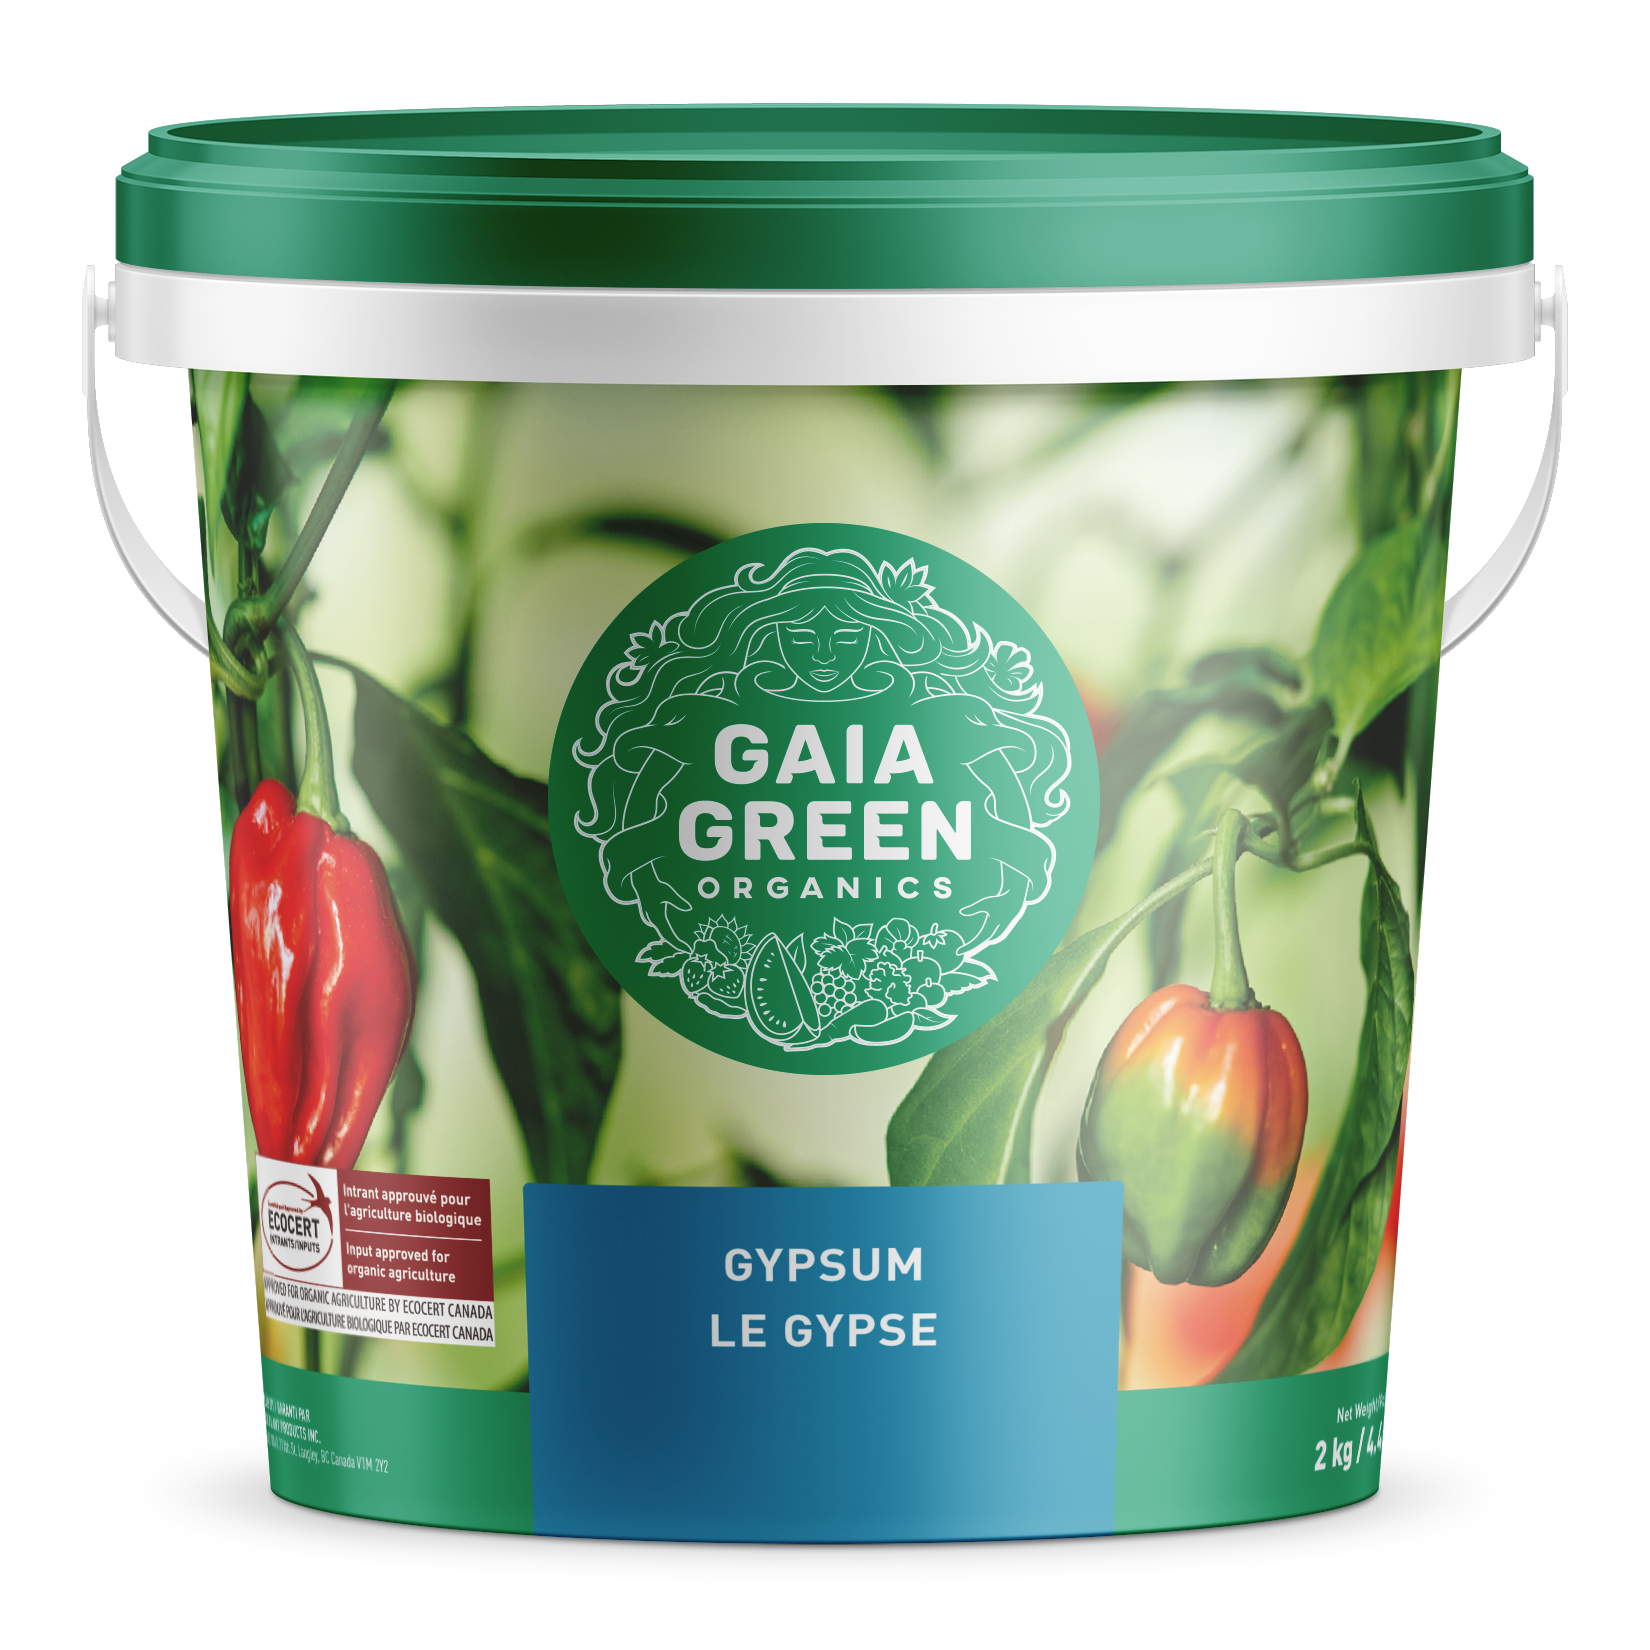 Gaia Green Gypsum